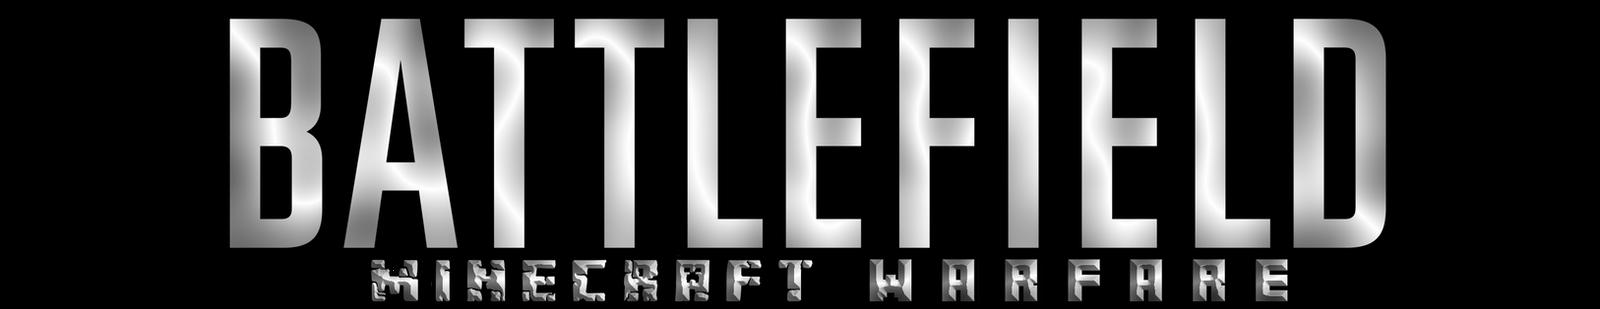 Battlefield: Minecraft Warfare Logo by WesleyVianen